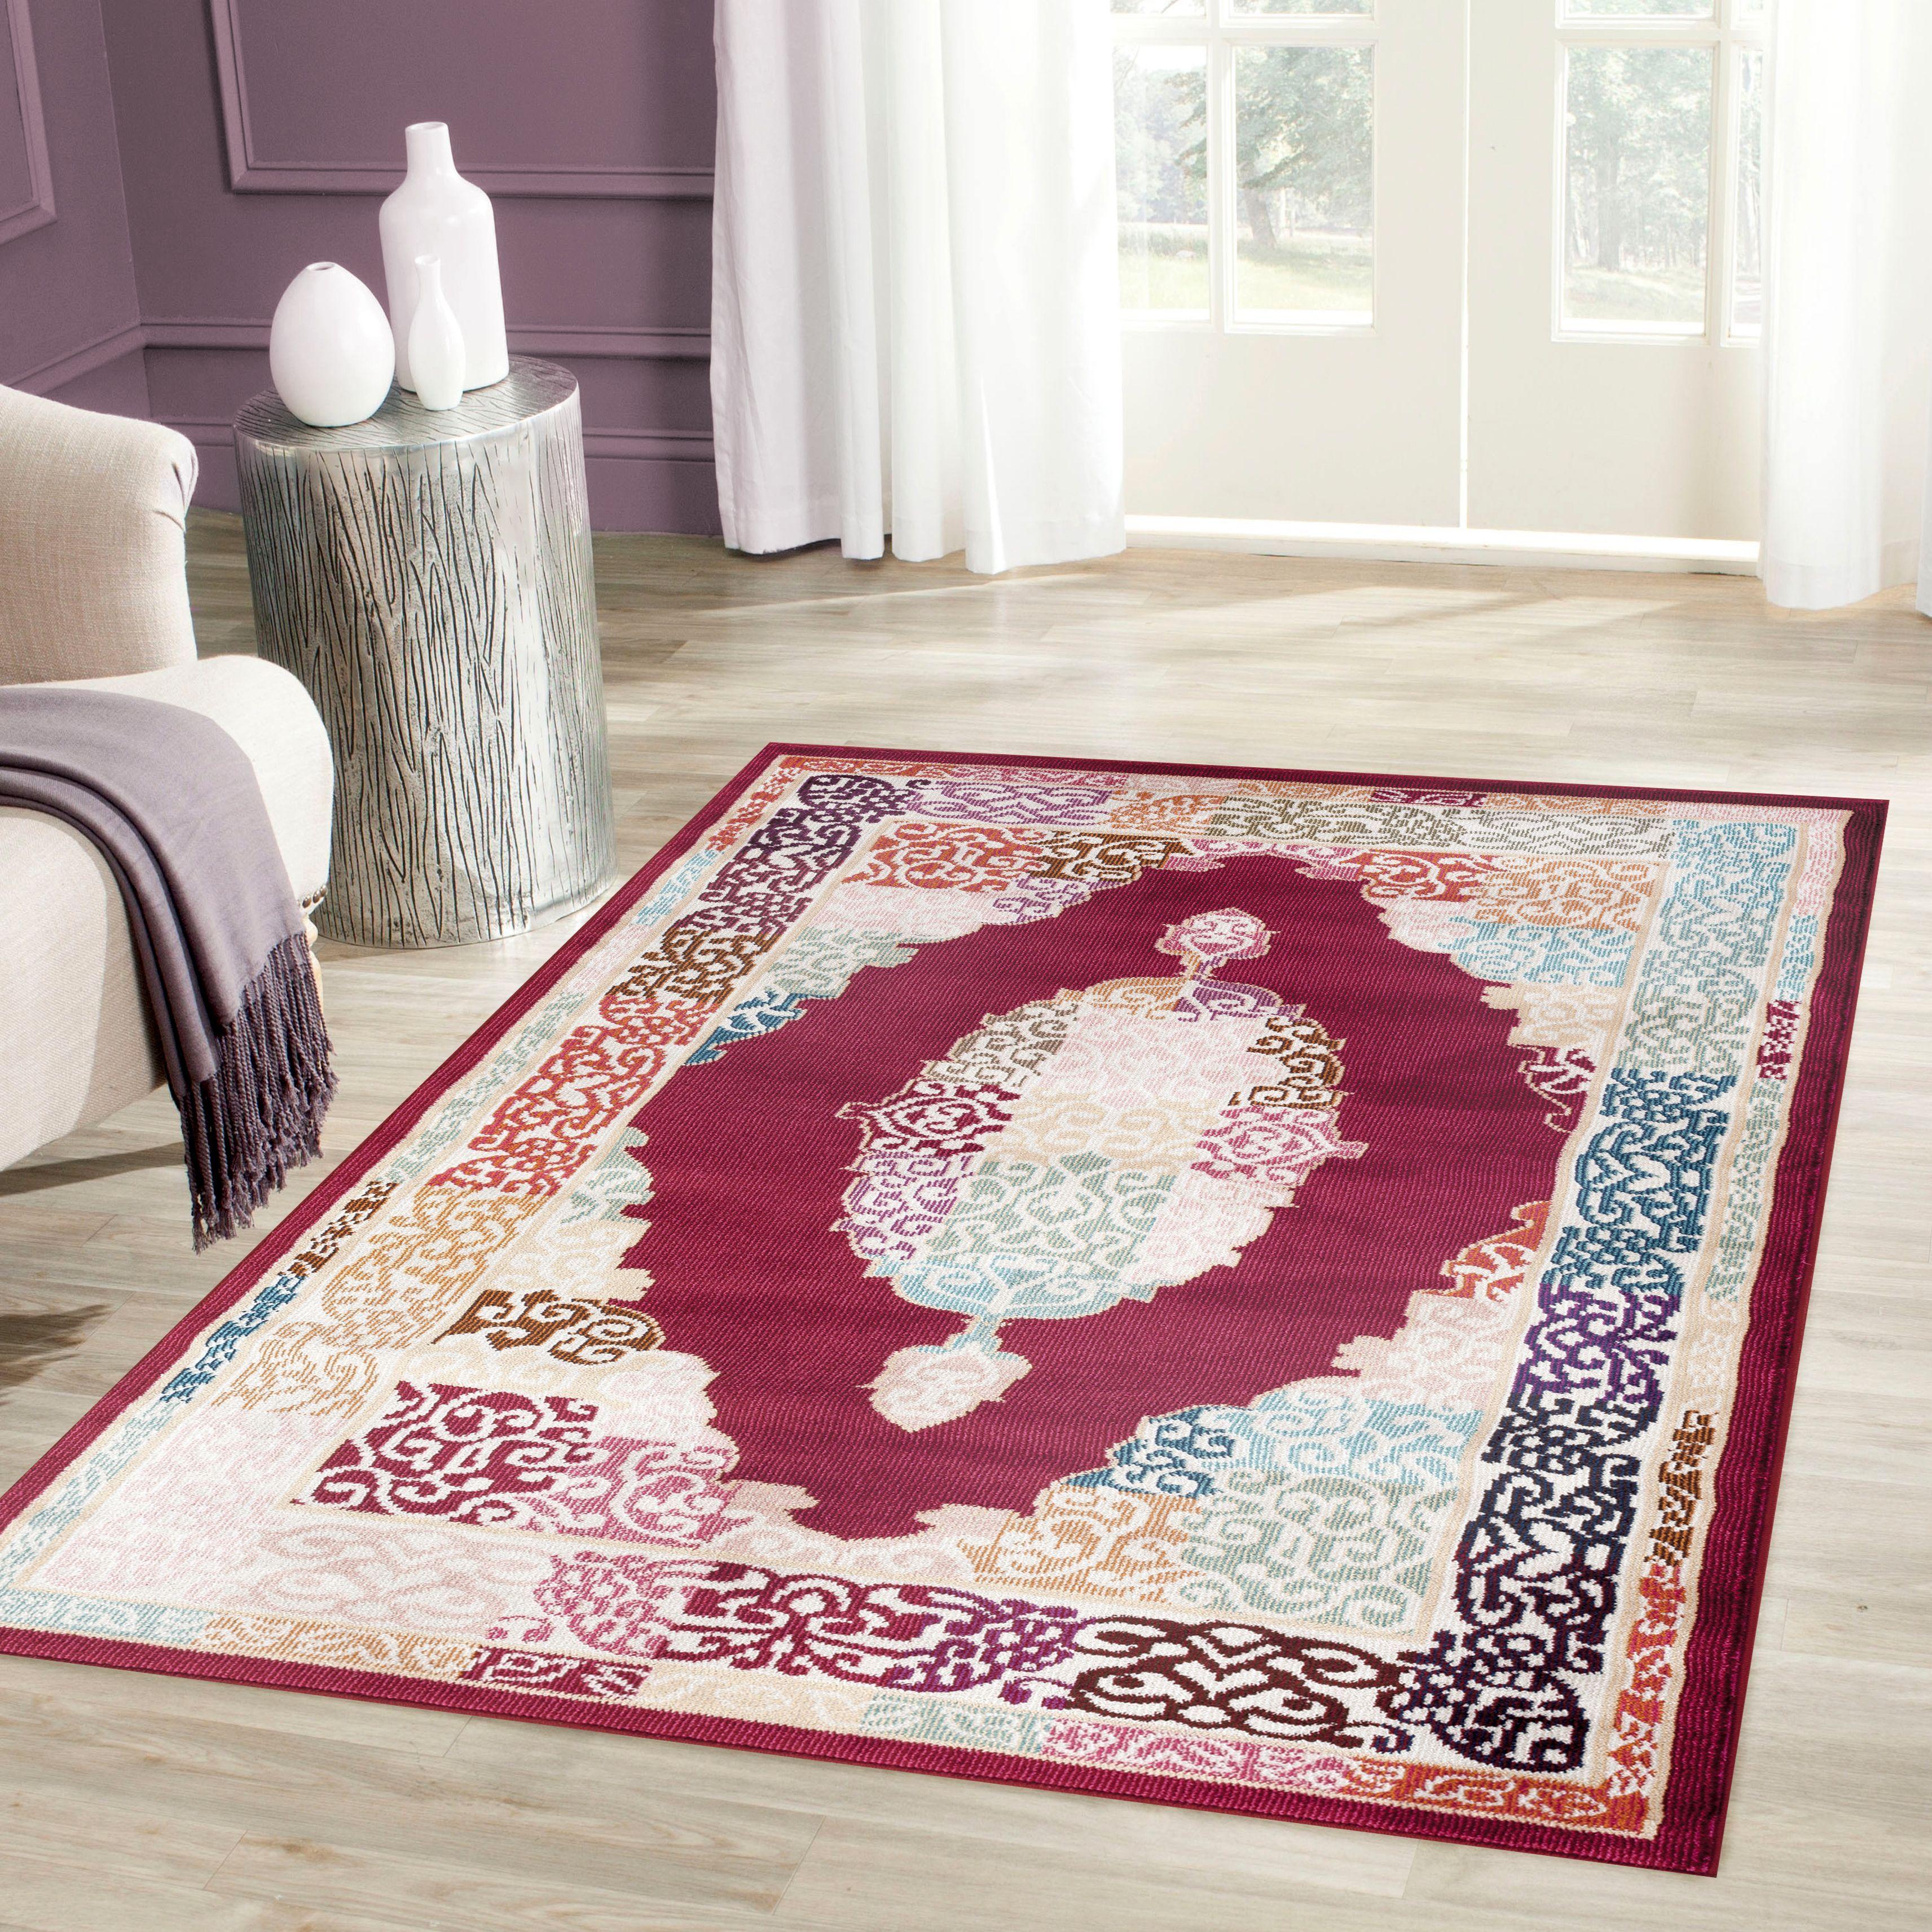 rug for living room size%0A OSTI Traditional Oriental Medallion Design Red Multicolored Indoor Area Rug     u      x   u             Red  X    Multi  Size   u      x   u      Polypropylene  Border